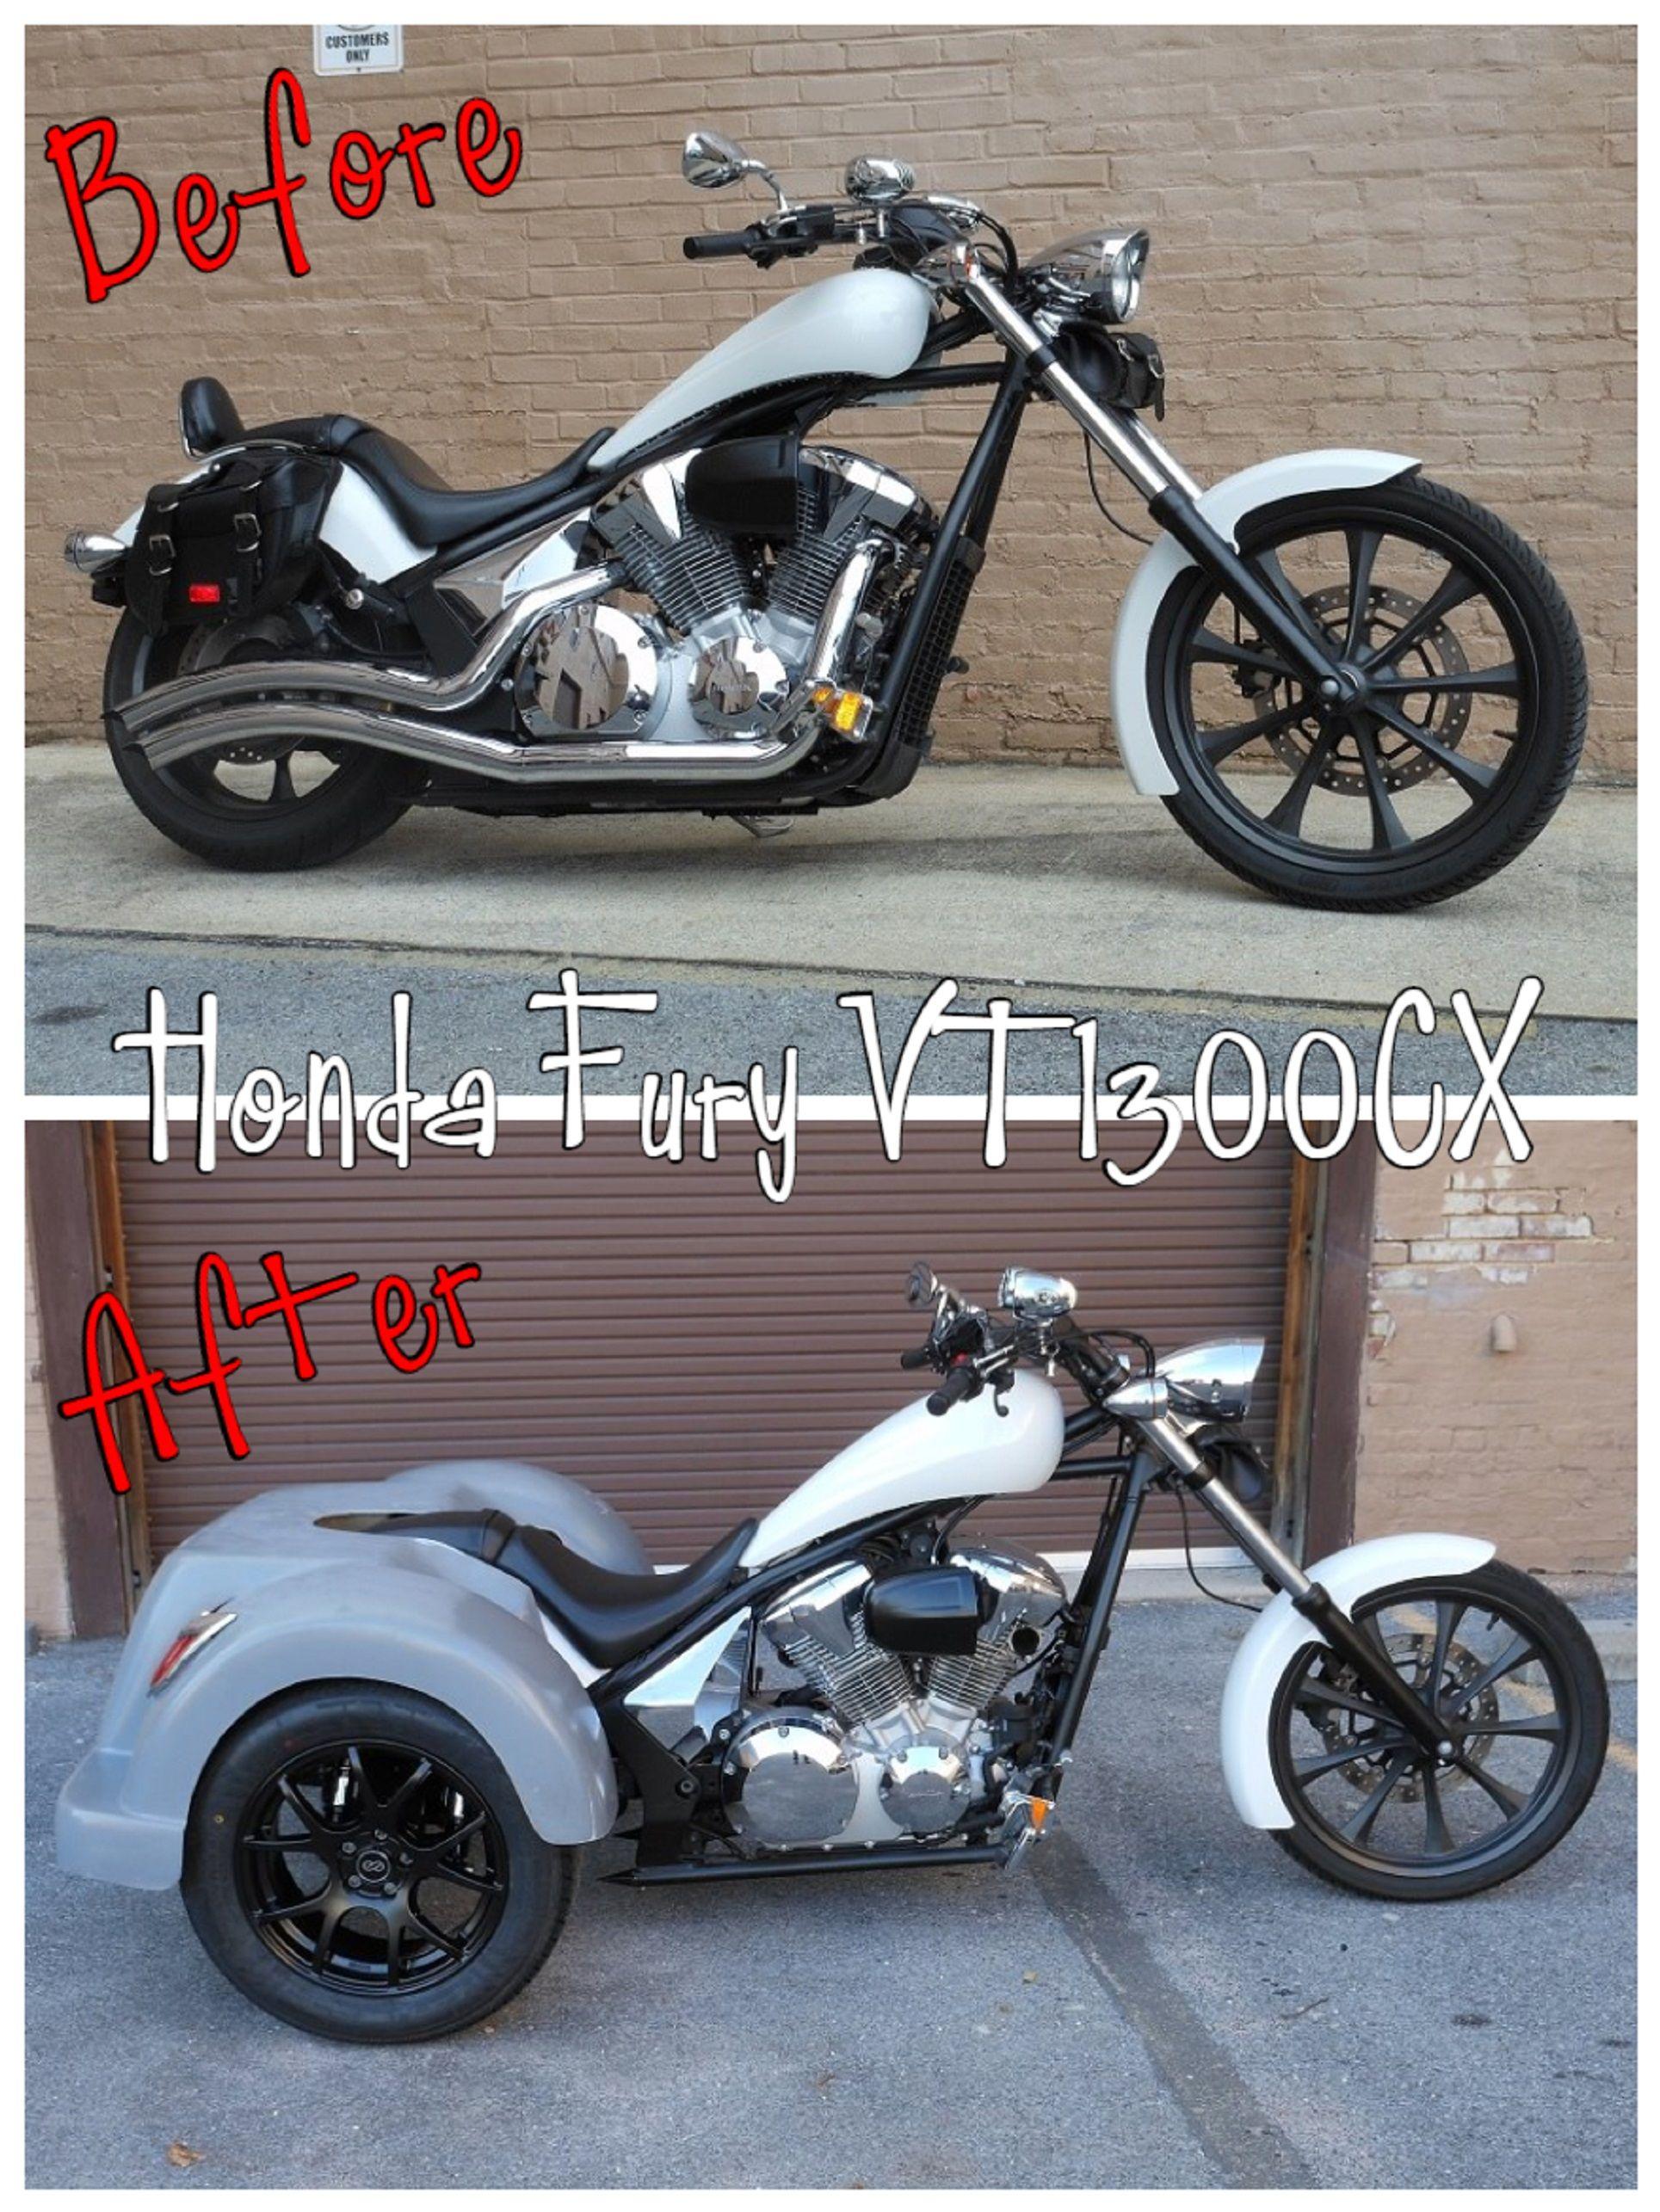 Honda Fury Vt1300cx Trike Before After Http Facebook Com Pg Fullcirclevtwin Photos Tab Album Album Id 584044338333359 Honda Fury Honda Cruiser Fury [ 2571 x 1929 Pixel ]